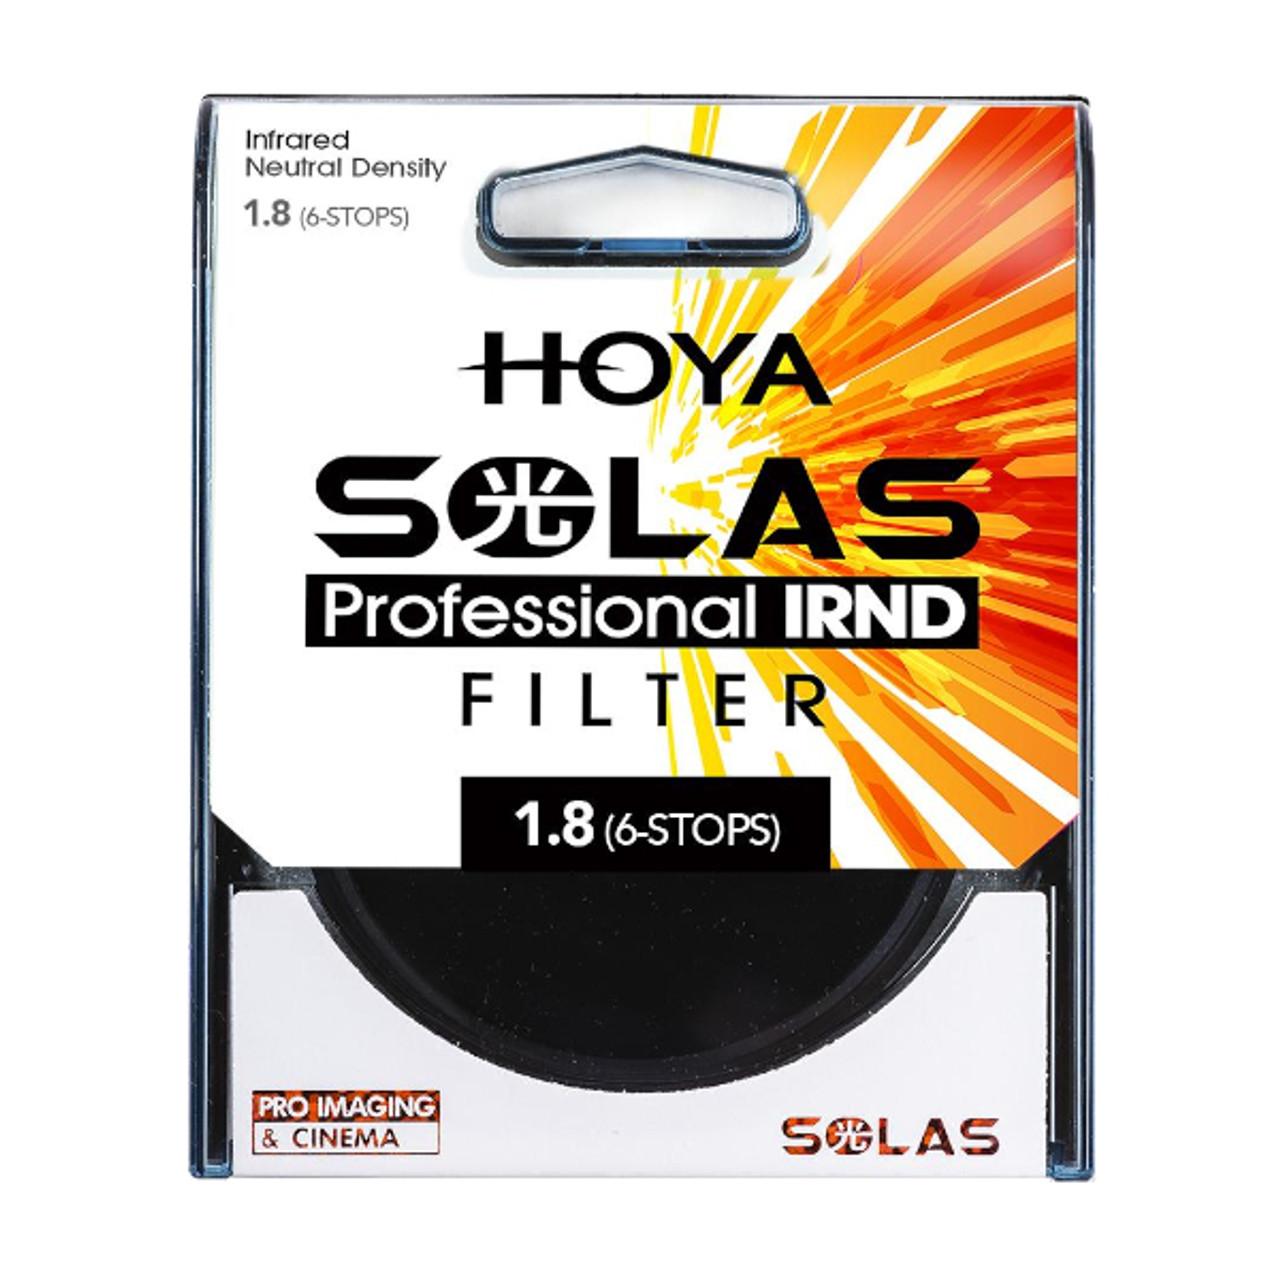 Hoya 52mm SOLAS IRND 1.8 (6-stop)